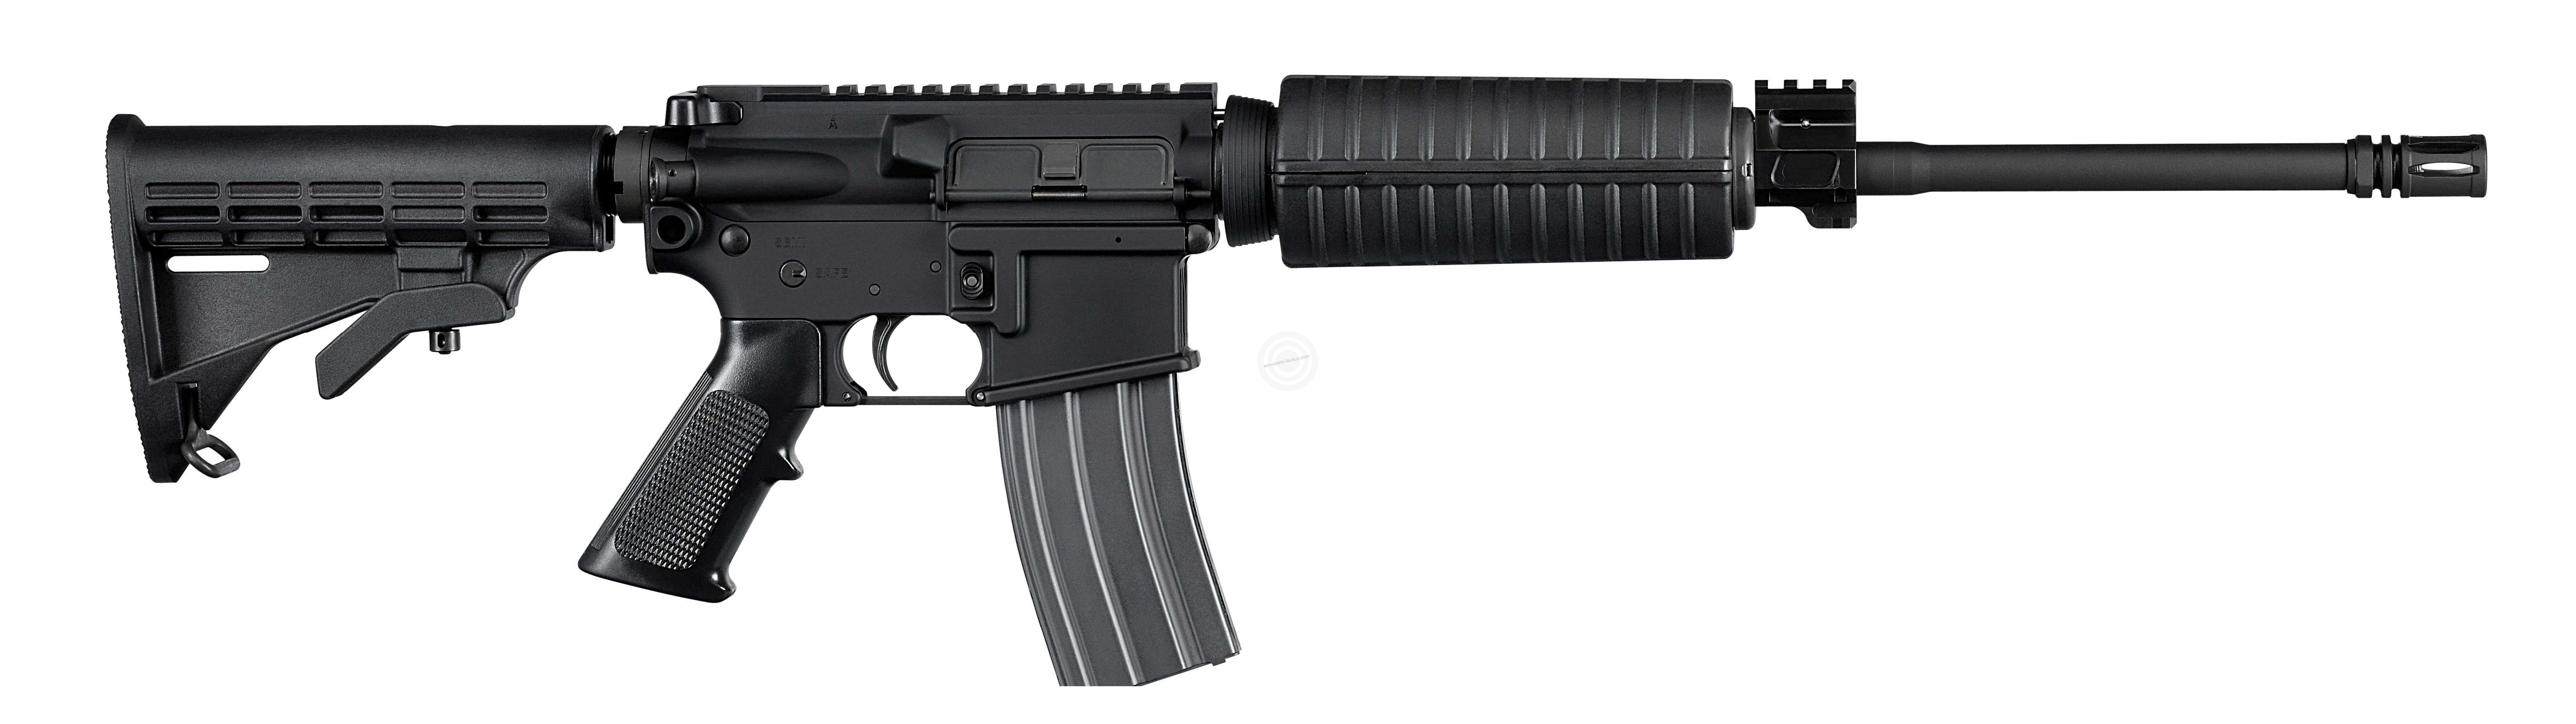 SIG SAUER M400 SRP cal.223 Rem